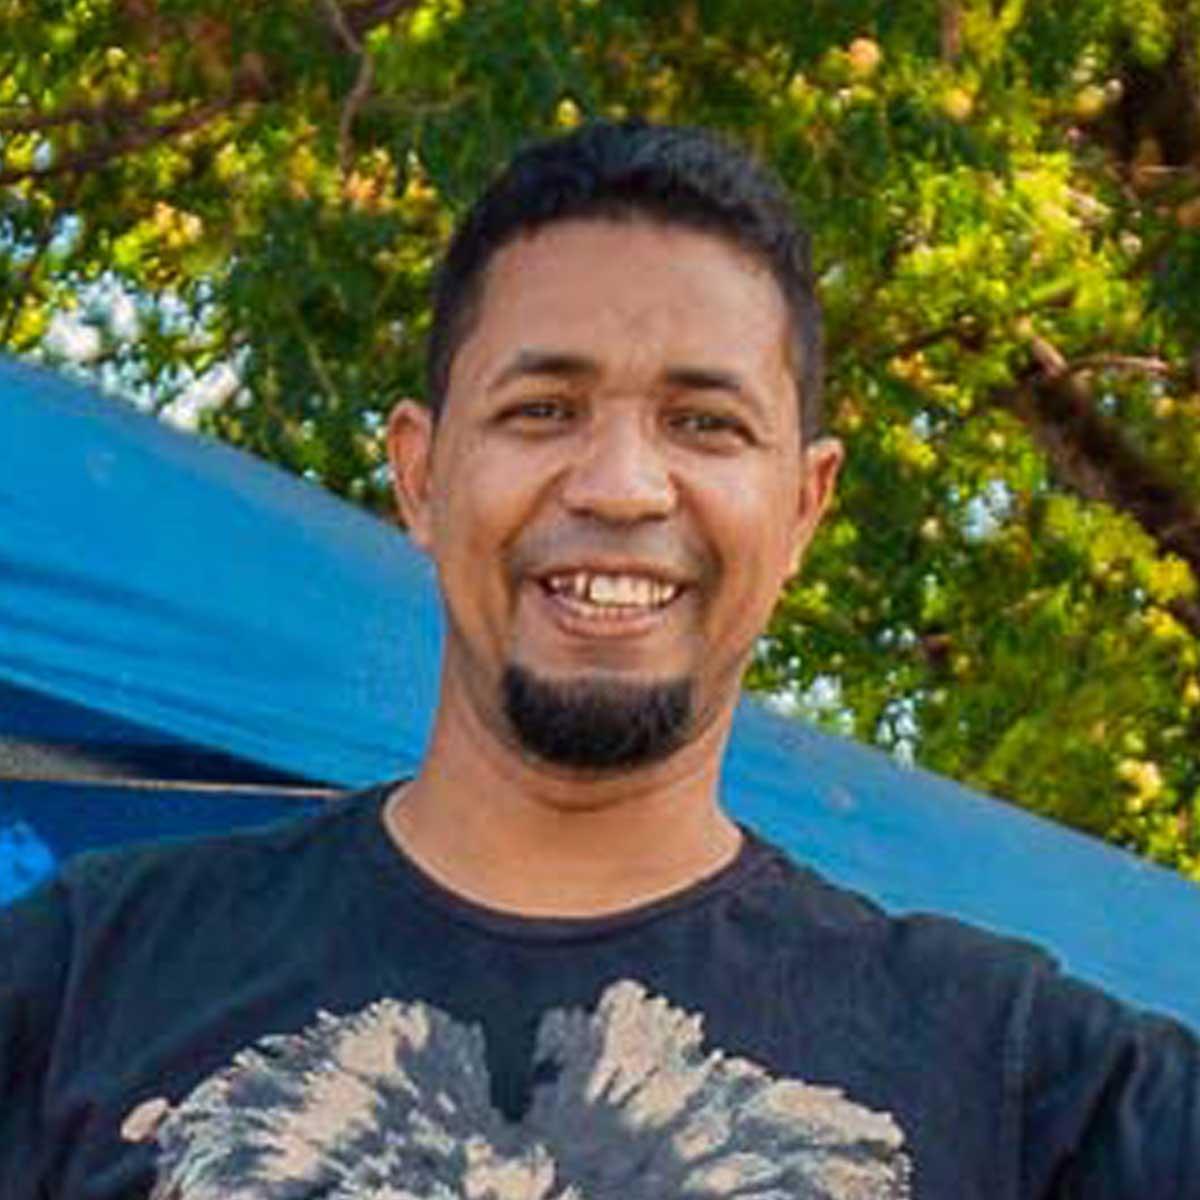 Wellington Batista Lemos